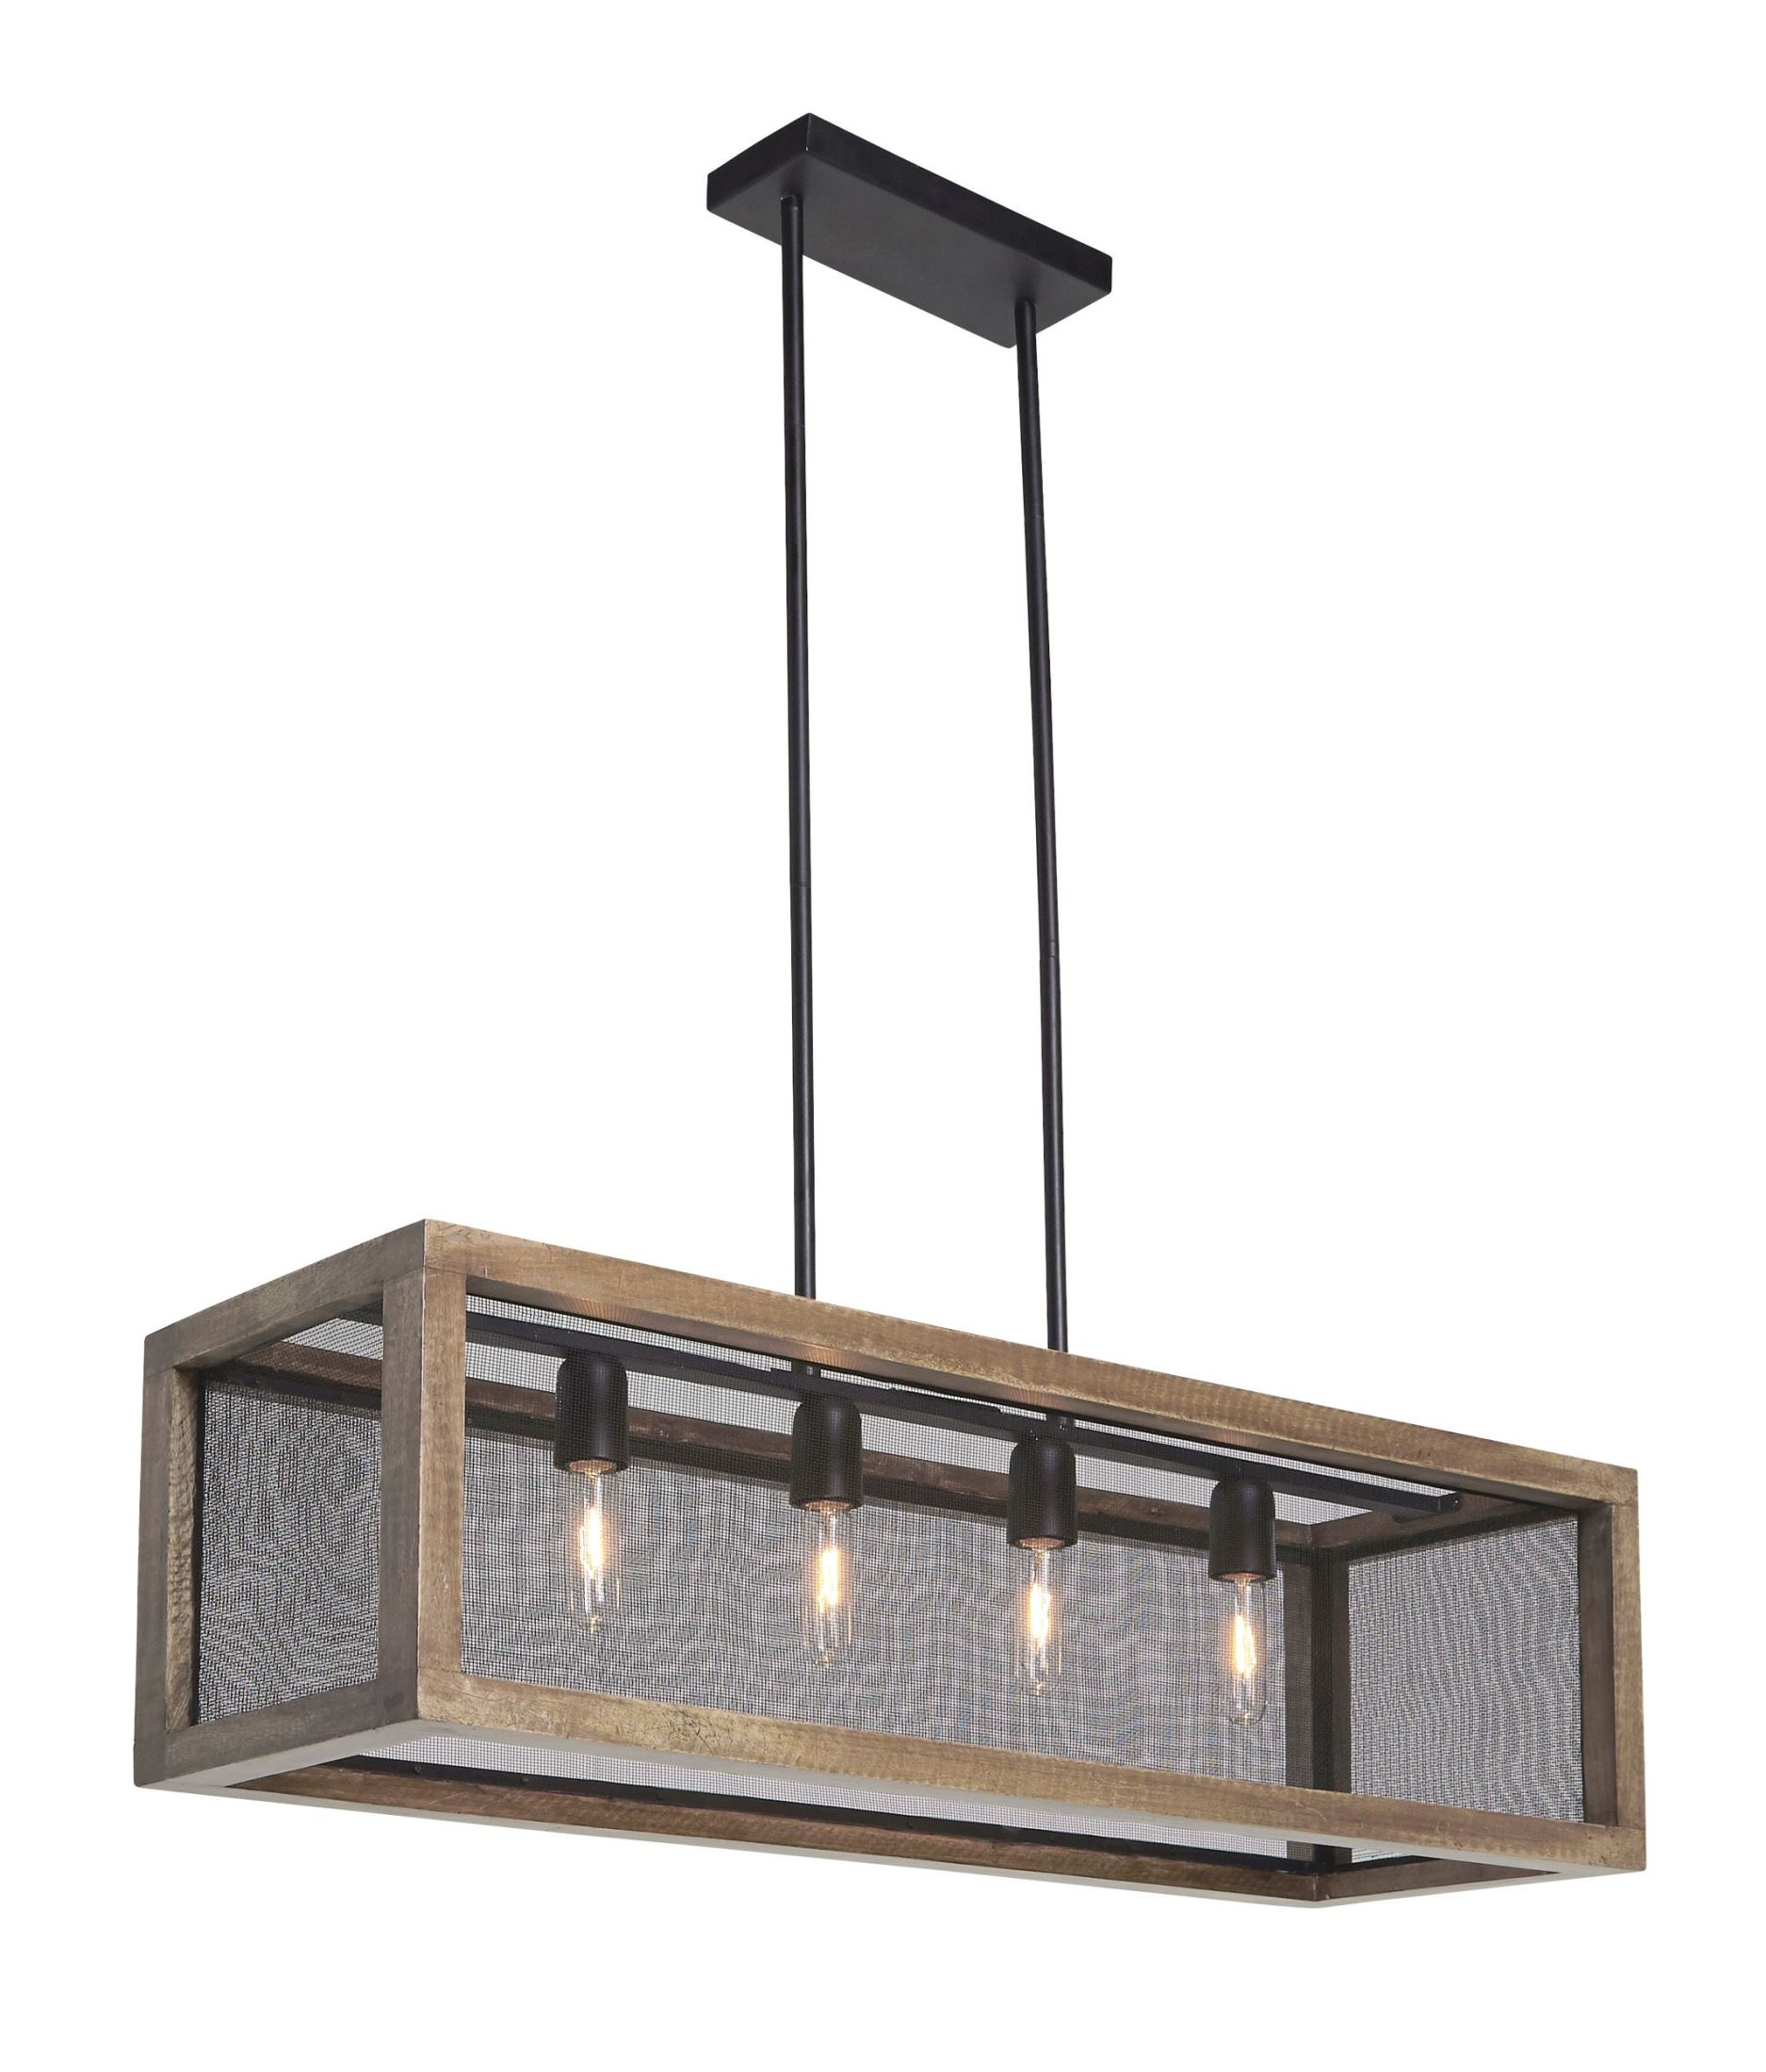 Uttermost 22050 Nashua 4 Light Wooden Lantern Pendant Gray Taupe